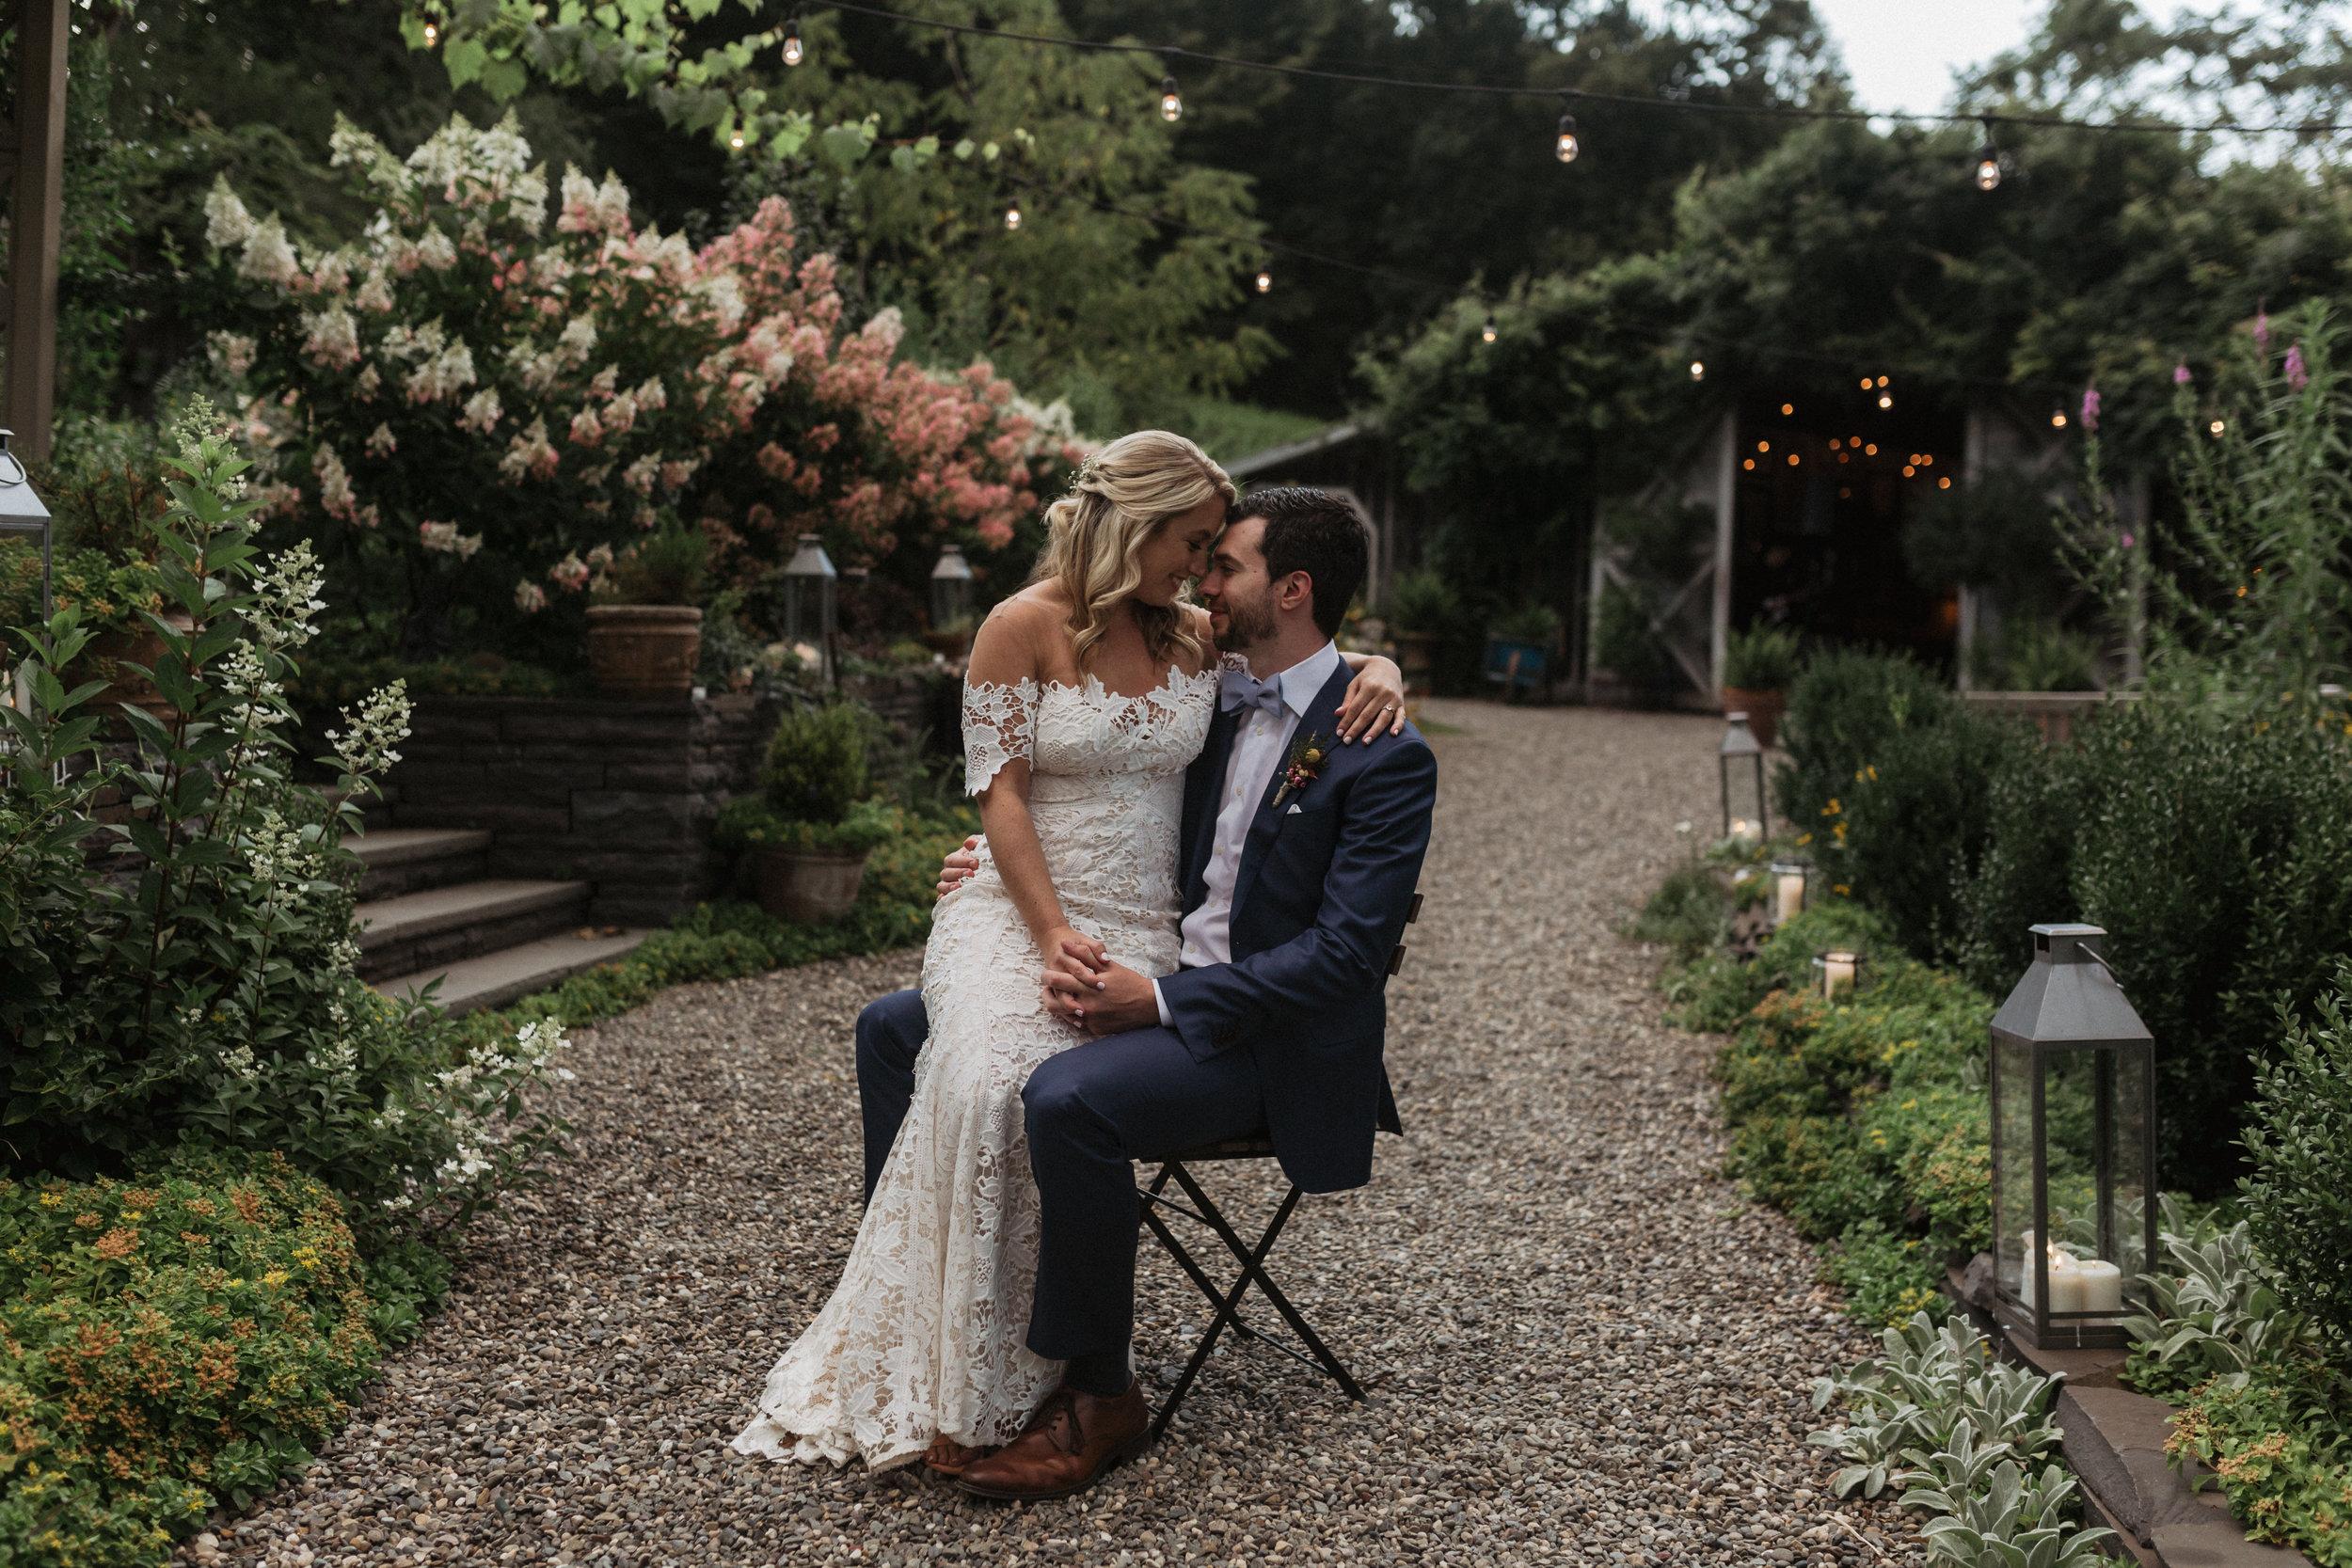 m-and-d-farm-wedding-96.jpg